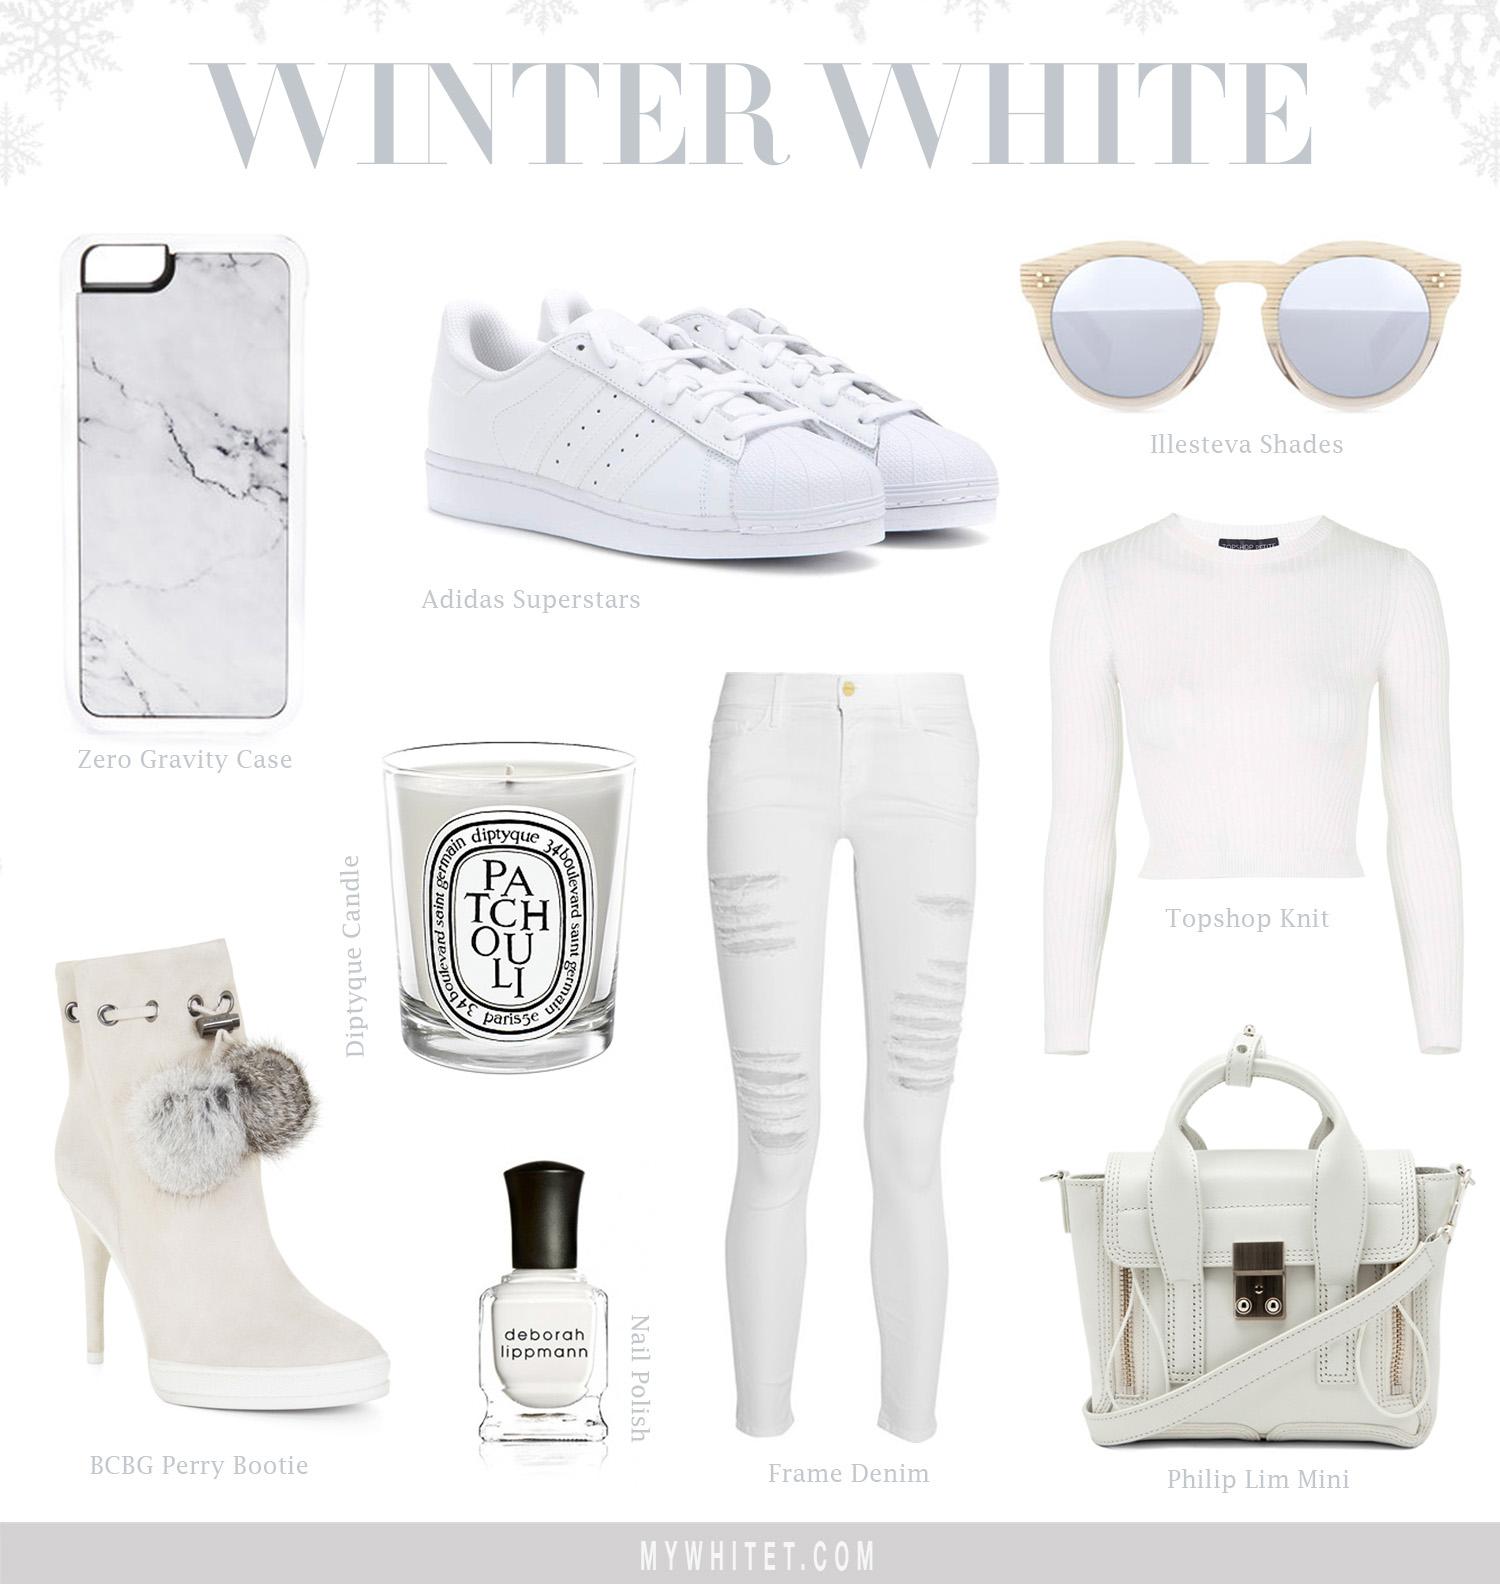 Jessi Malay's Winter White Collage